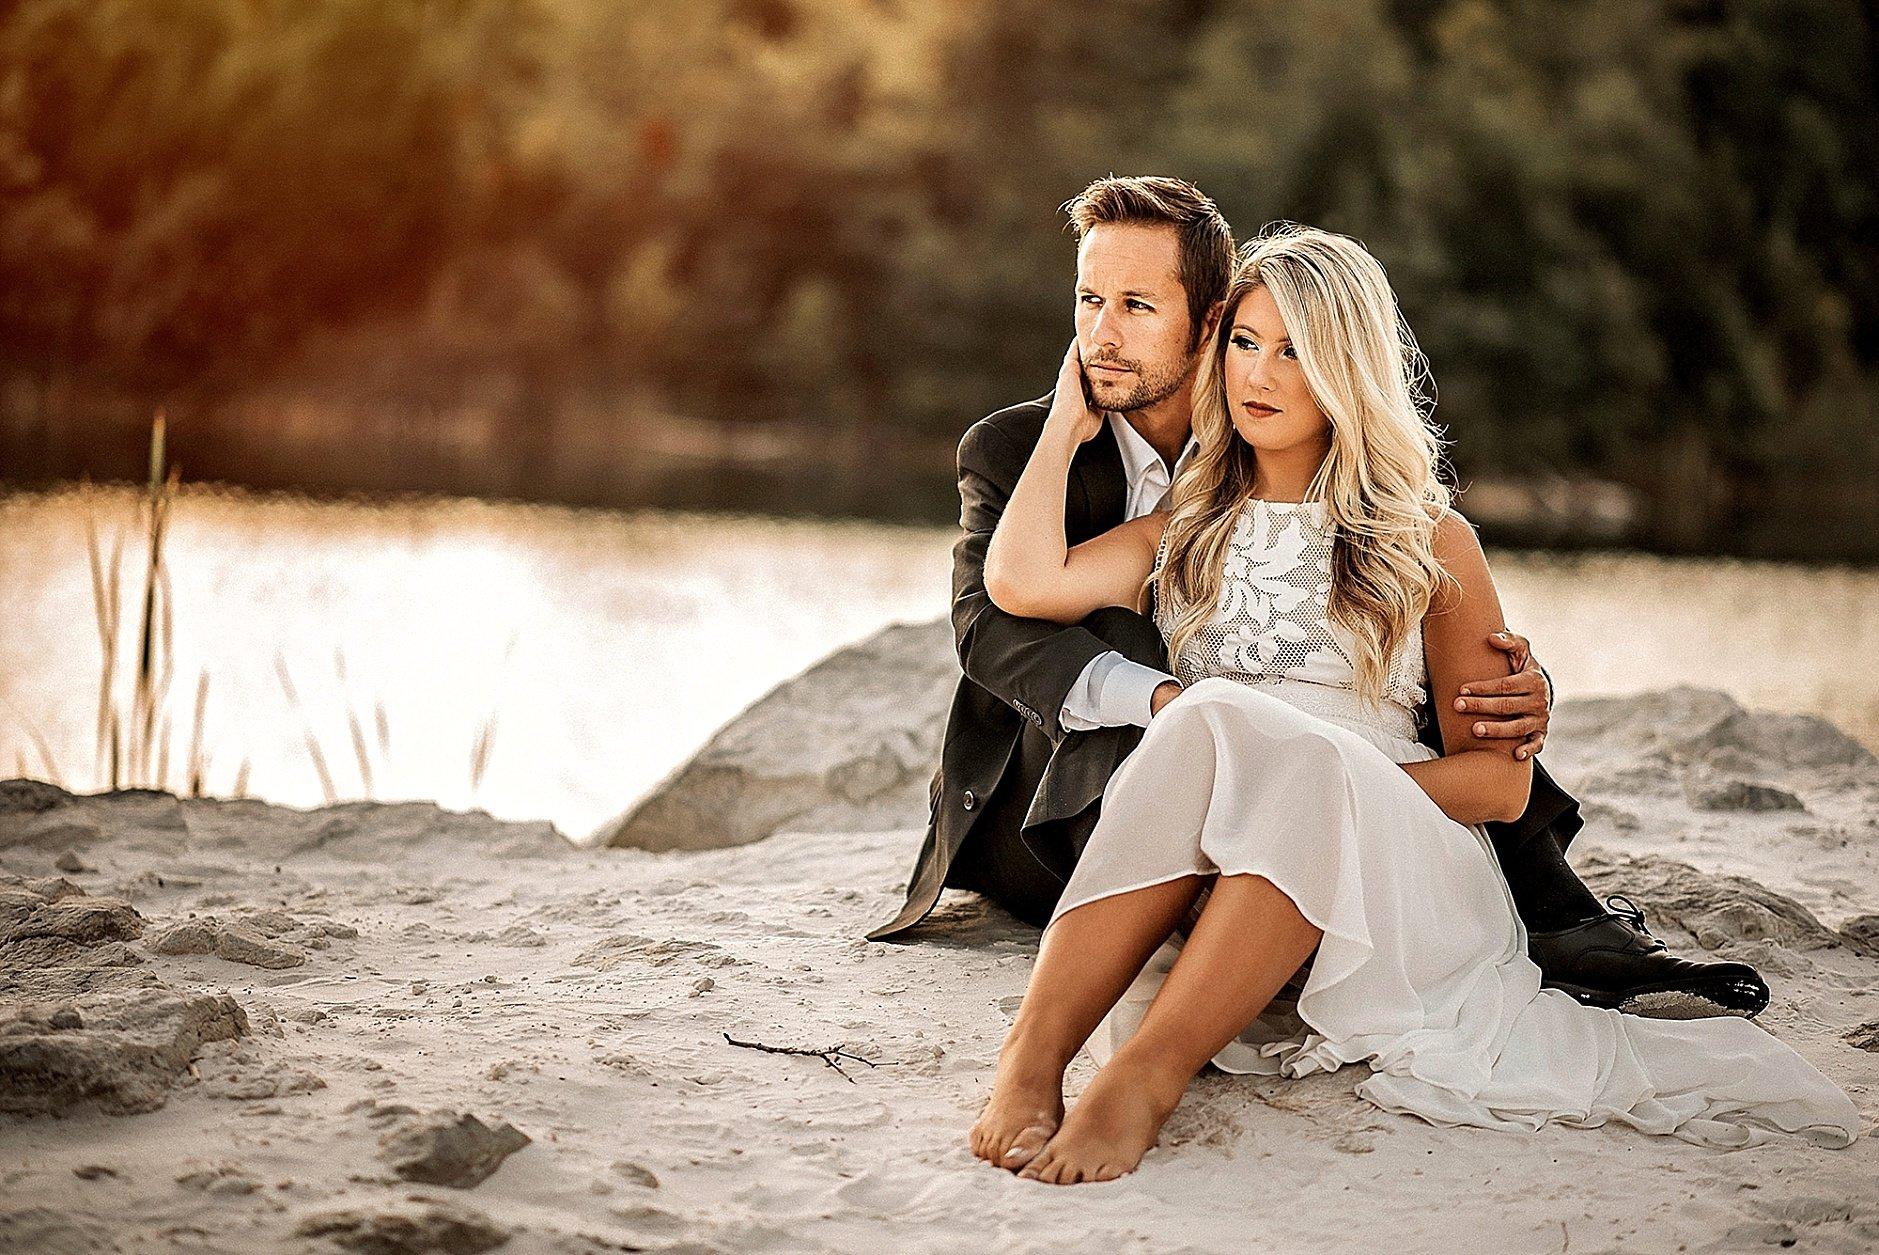 Romantic Engagement session at Klondike Park